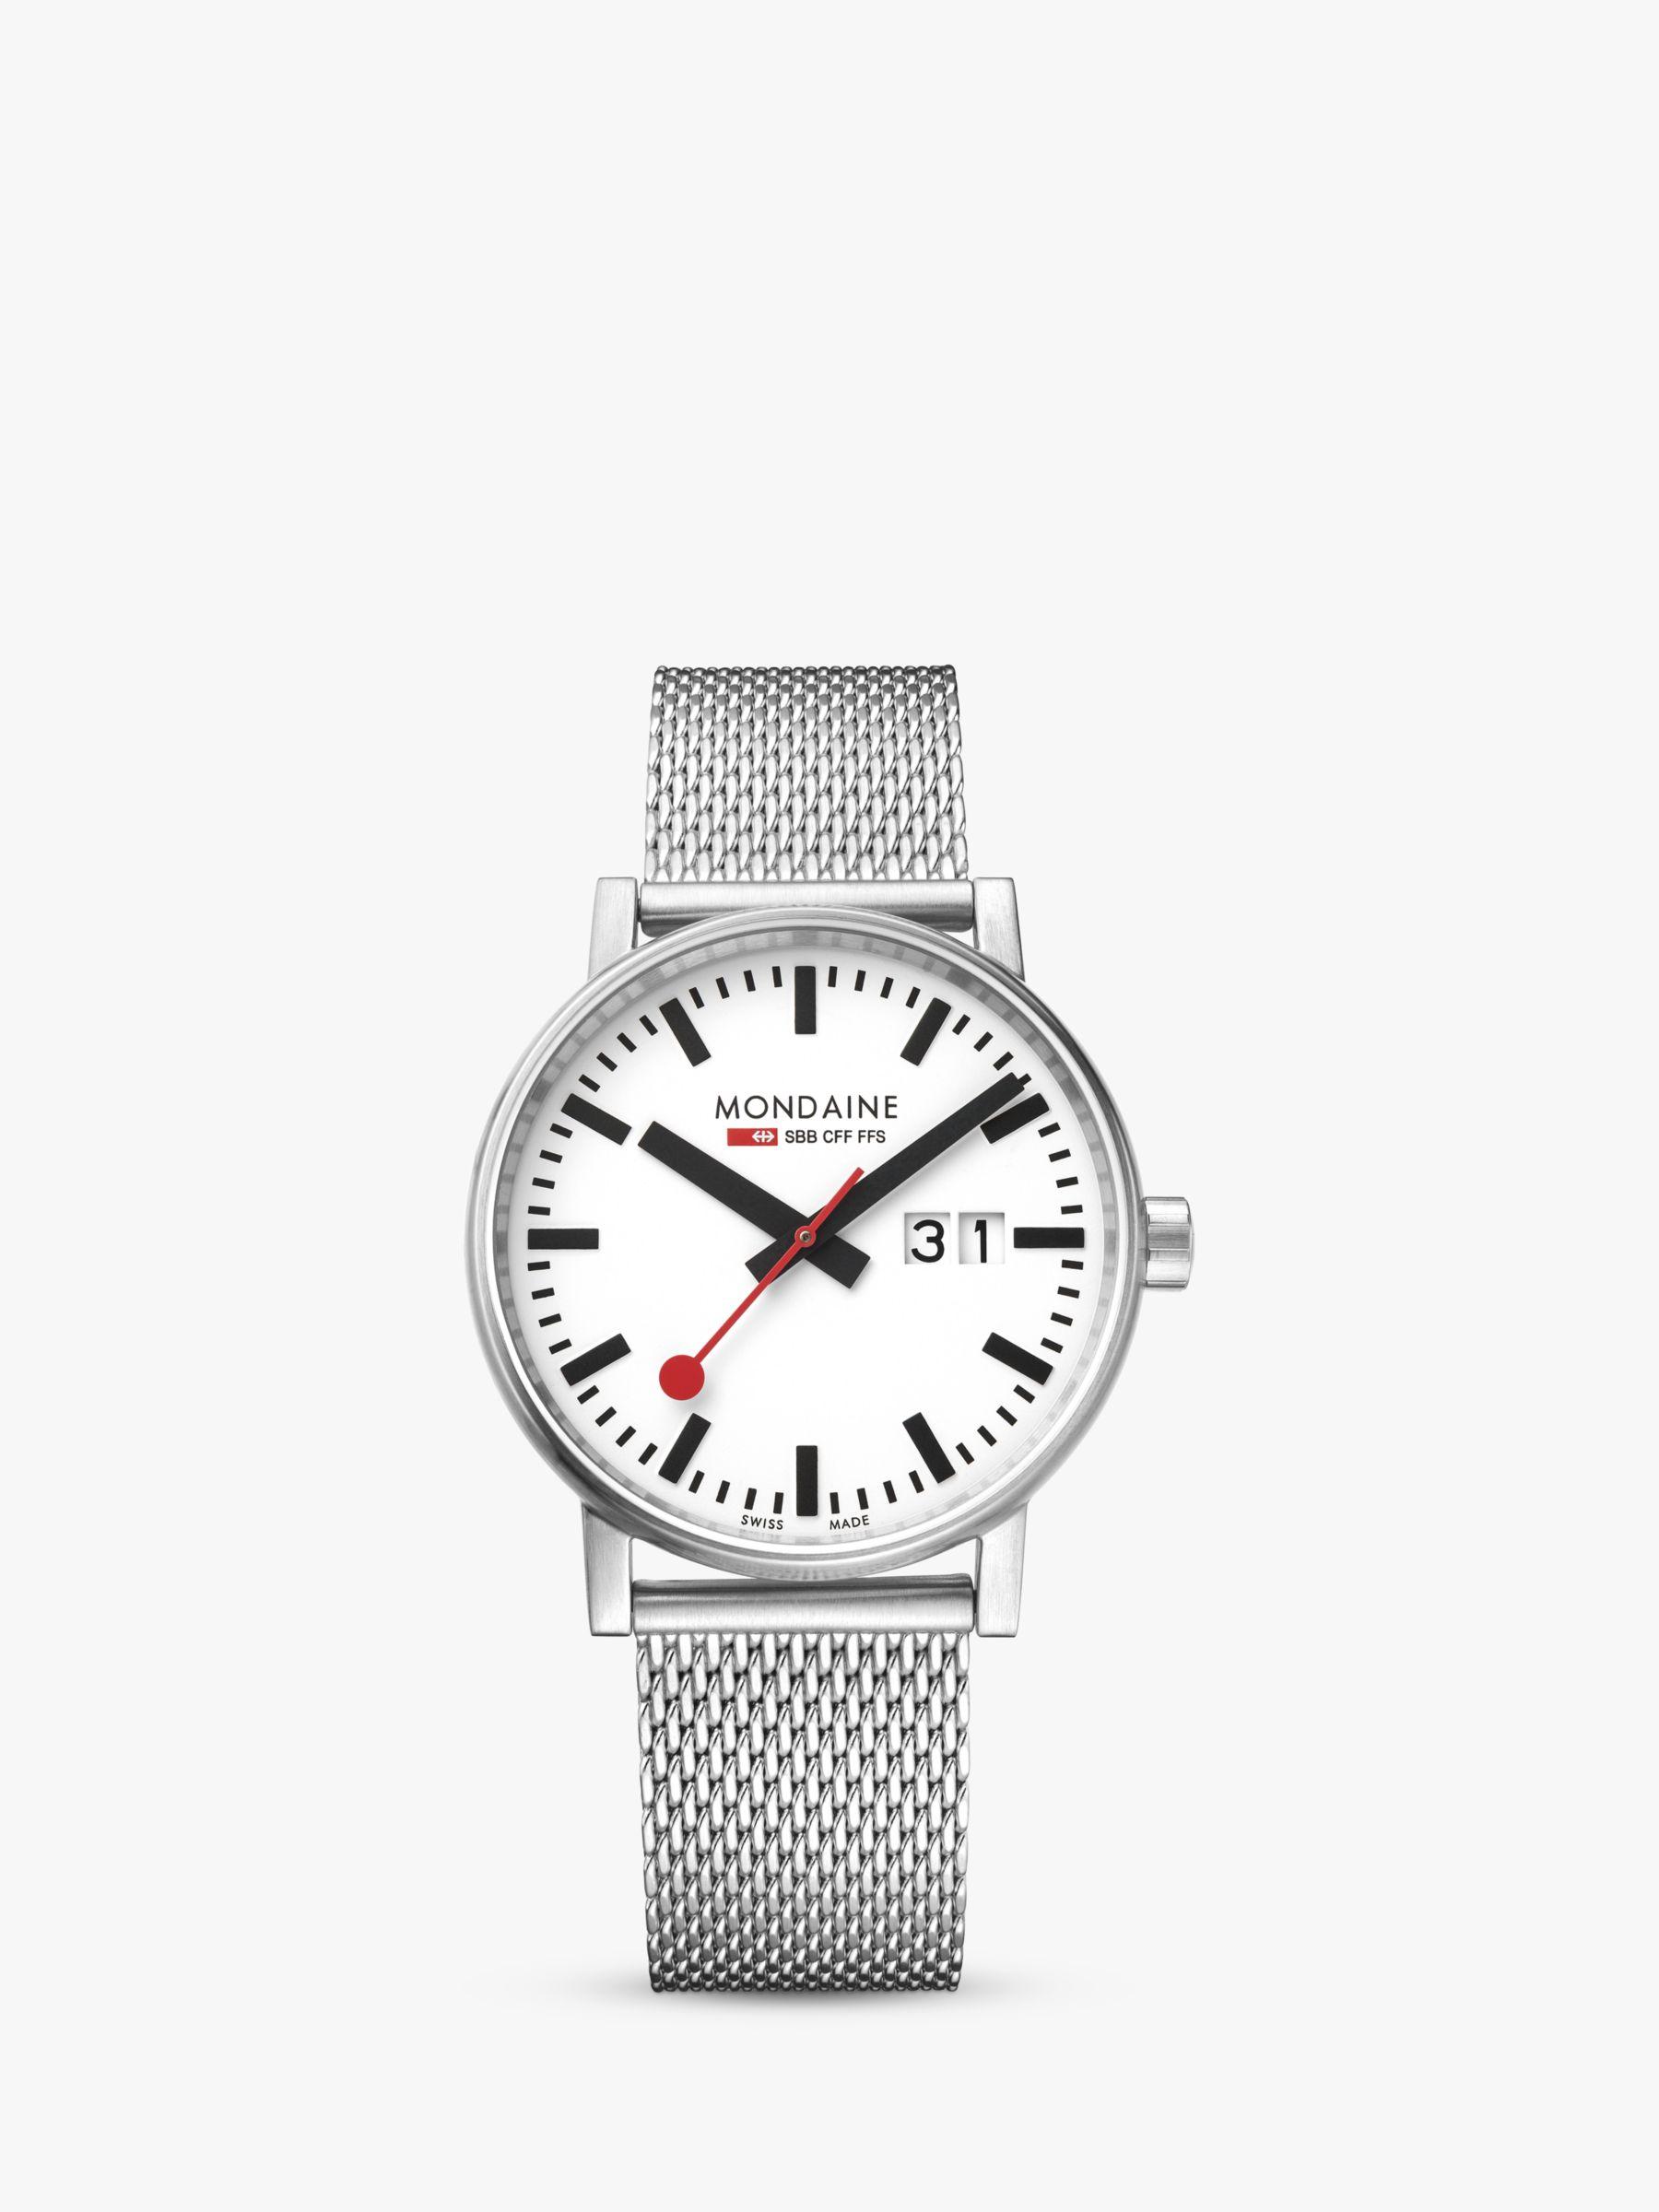 Mondaine Mondaine MSE.40210.SM Unisex Evo 2 Date Mesh Bracelet Strap Watch, Silver/White